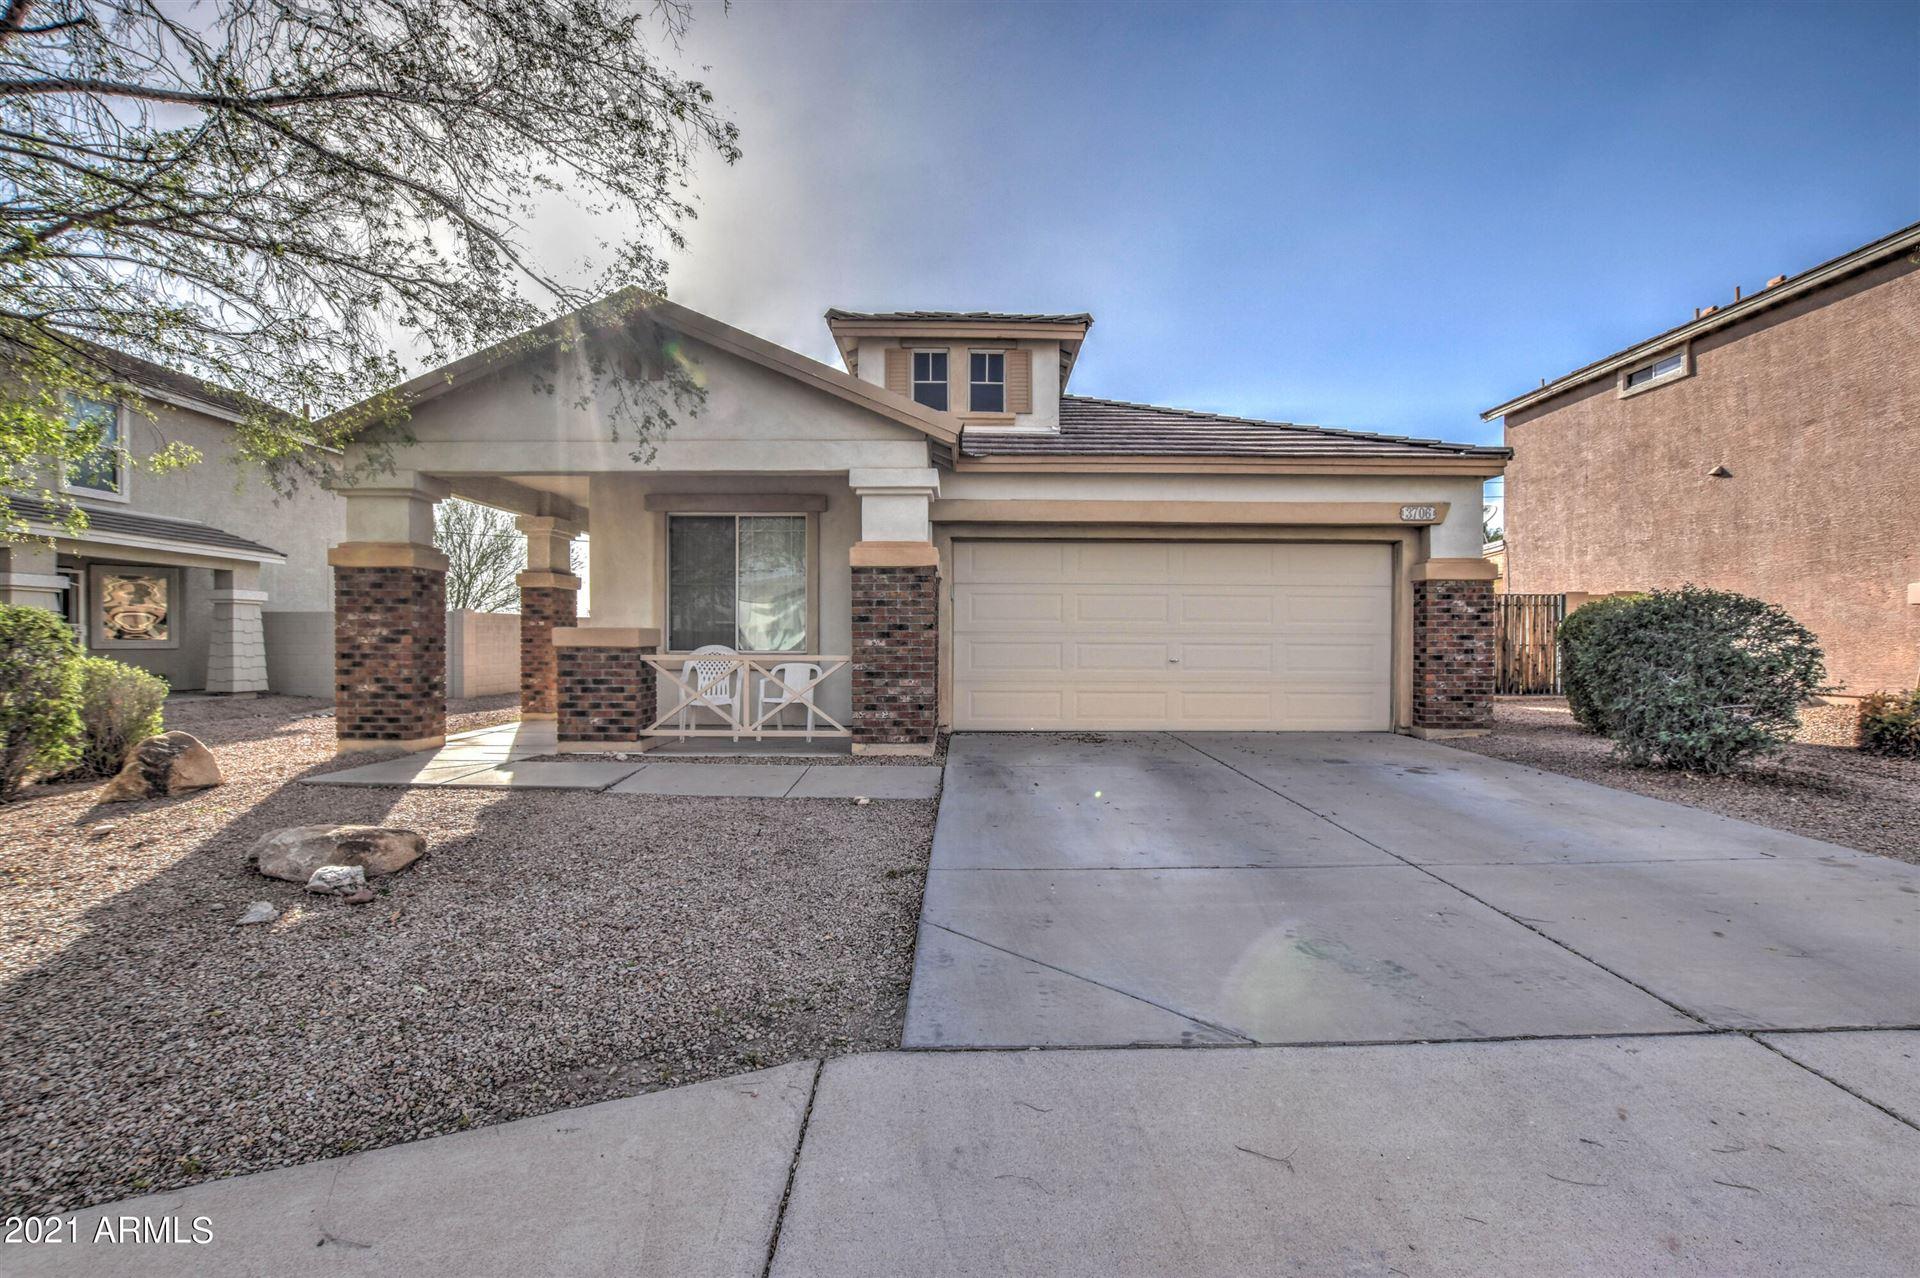 Photo of 3706 S Descanso Road, Apache Junction, AZ 85119 (MLS # 6202244)